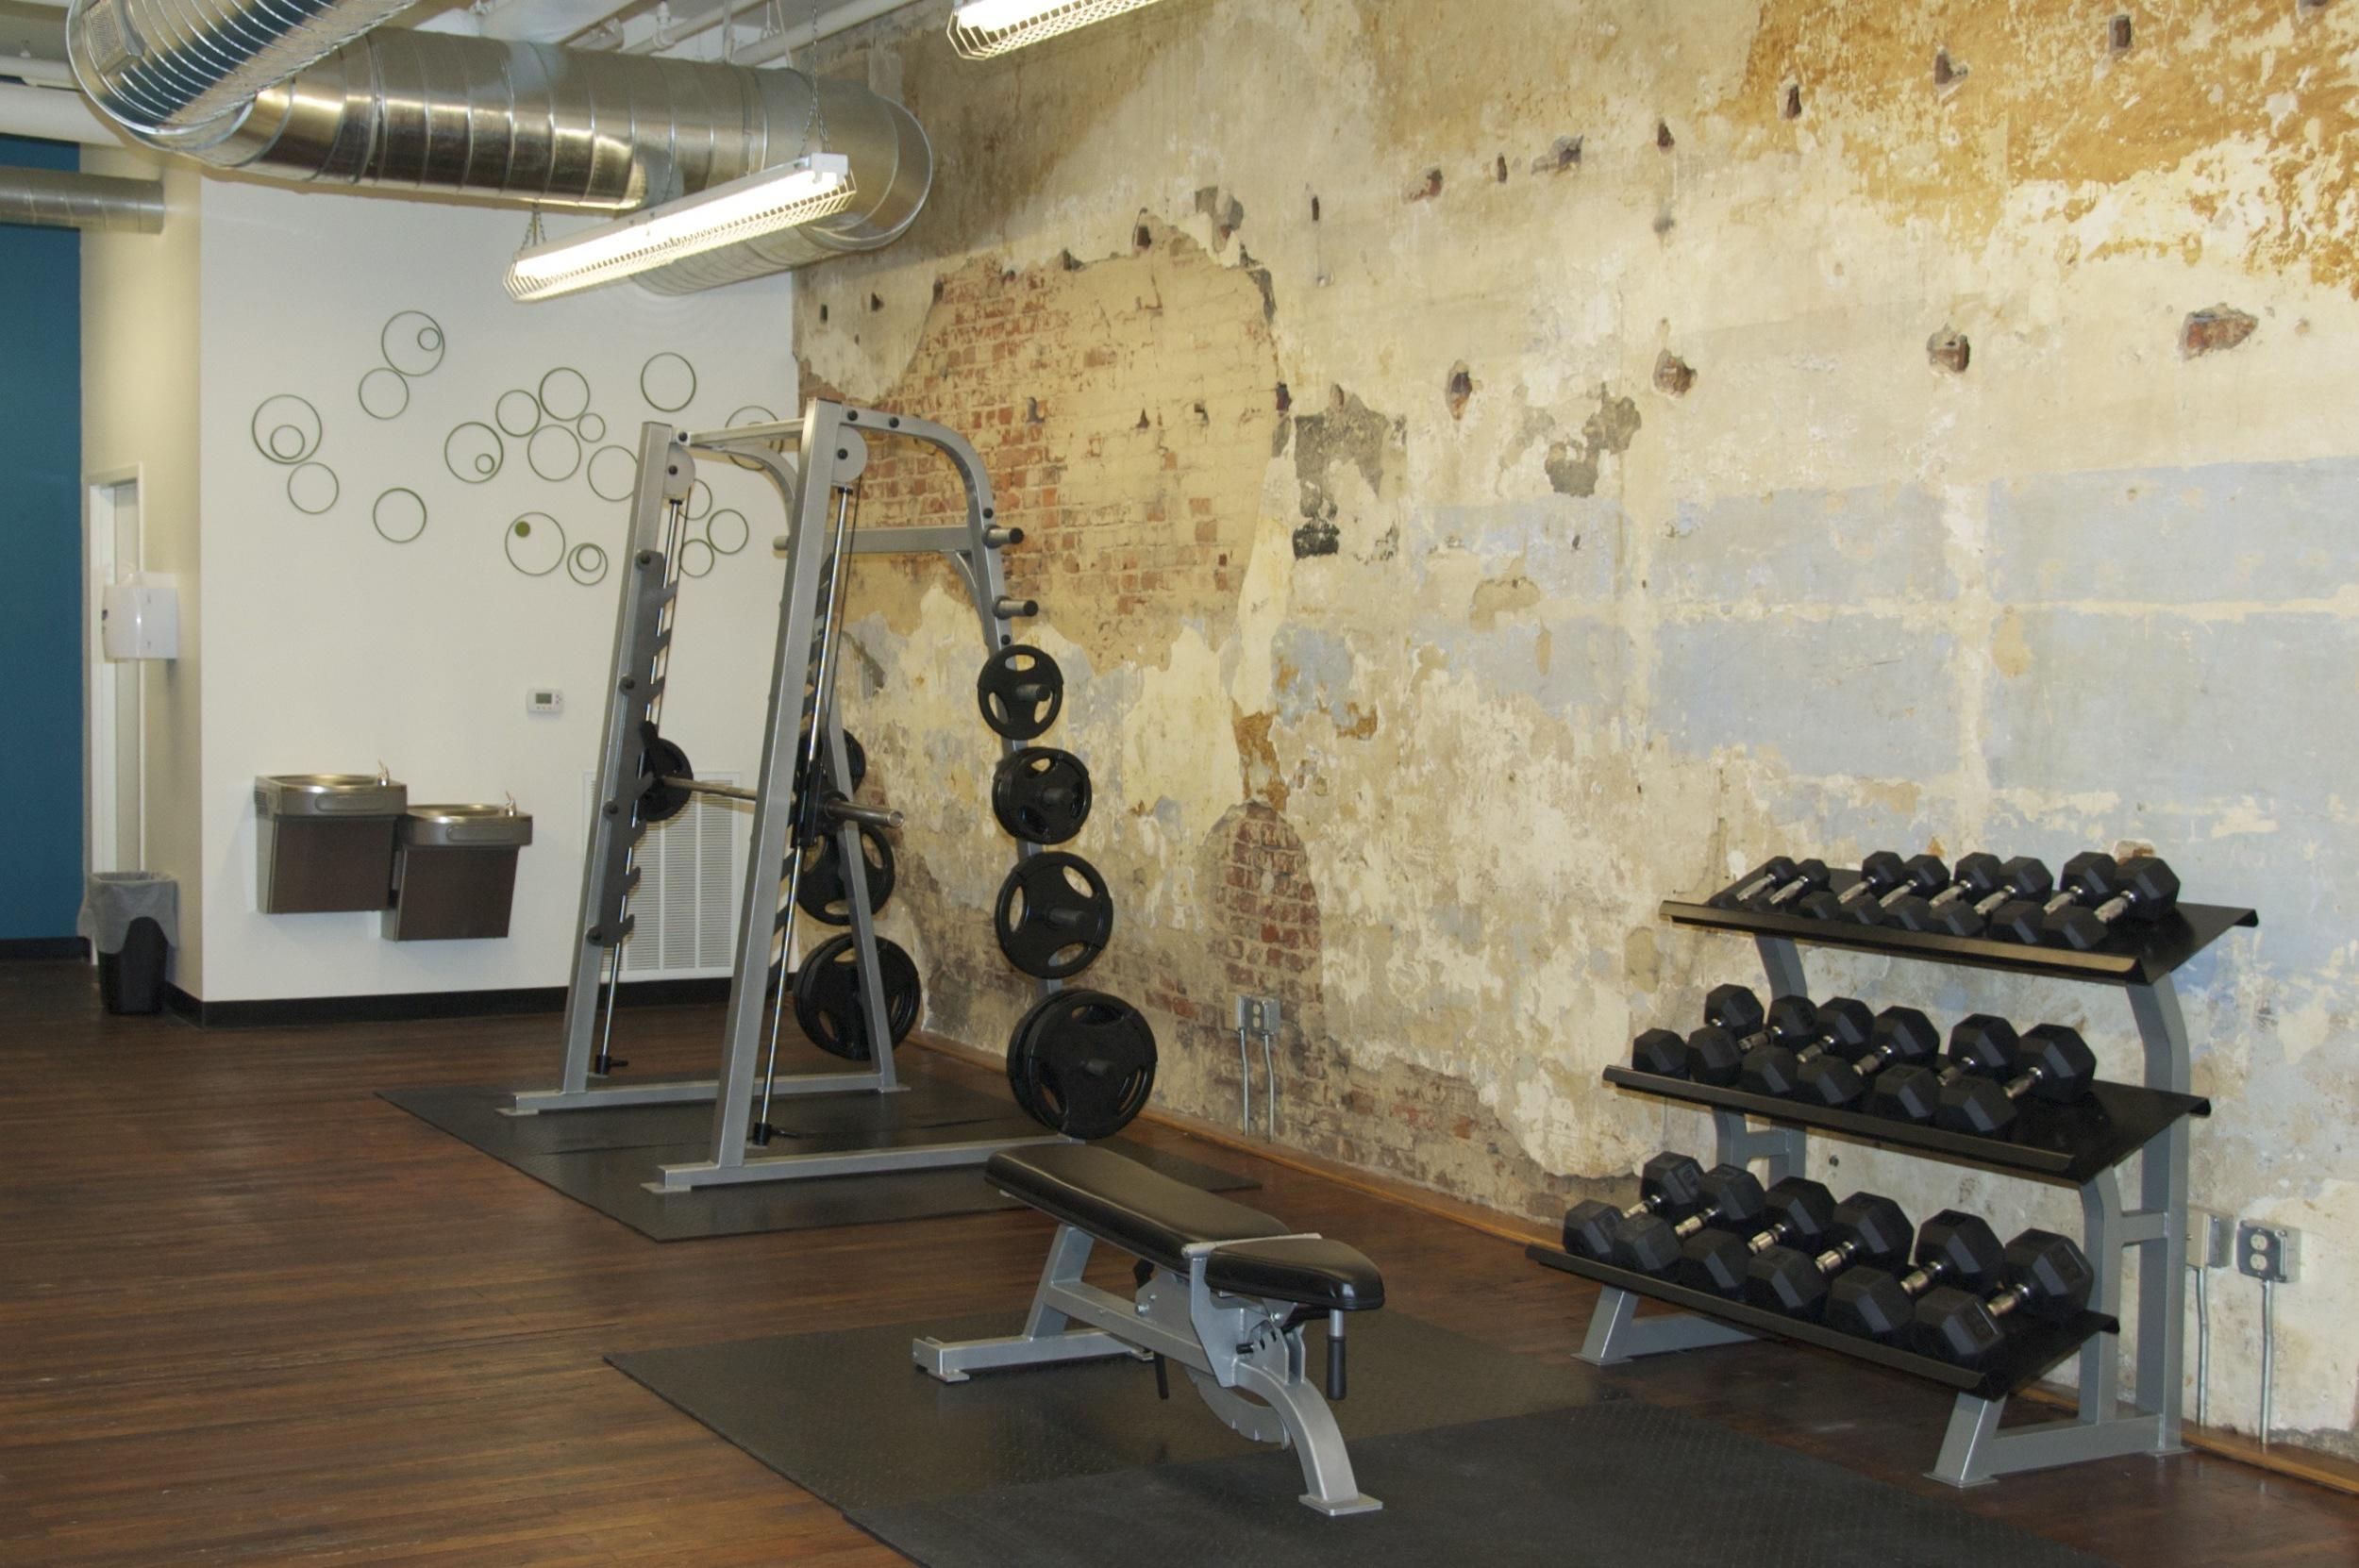 flats fitness 07.jpg